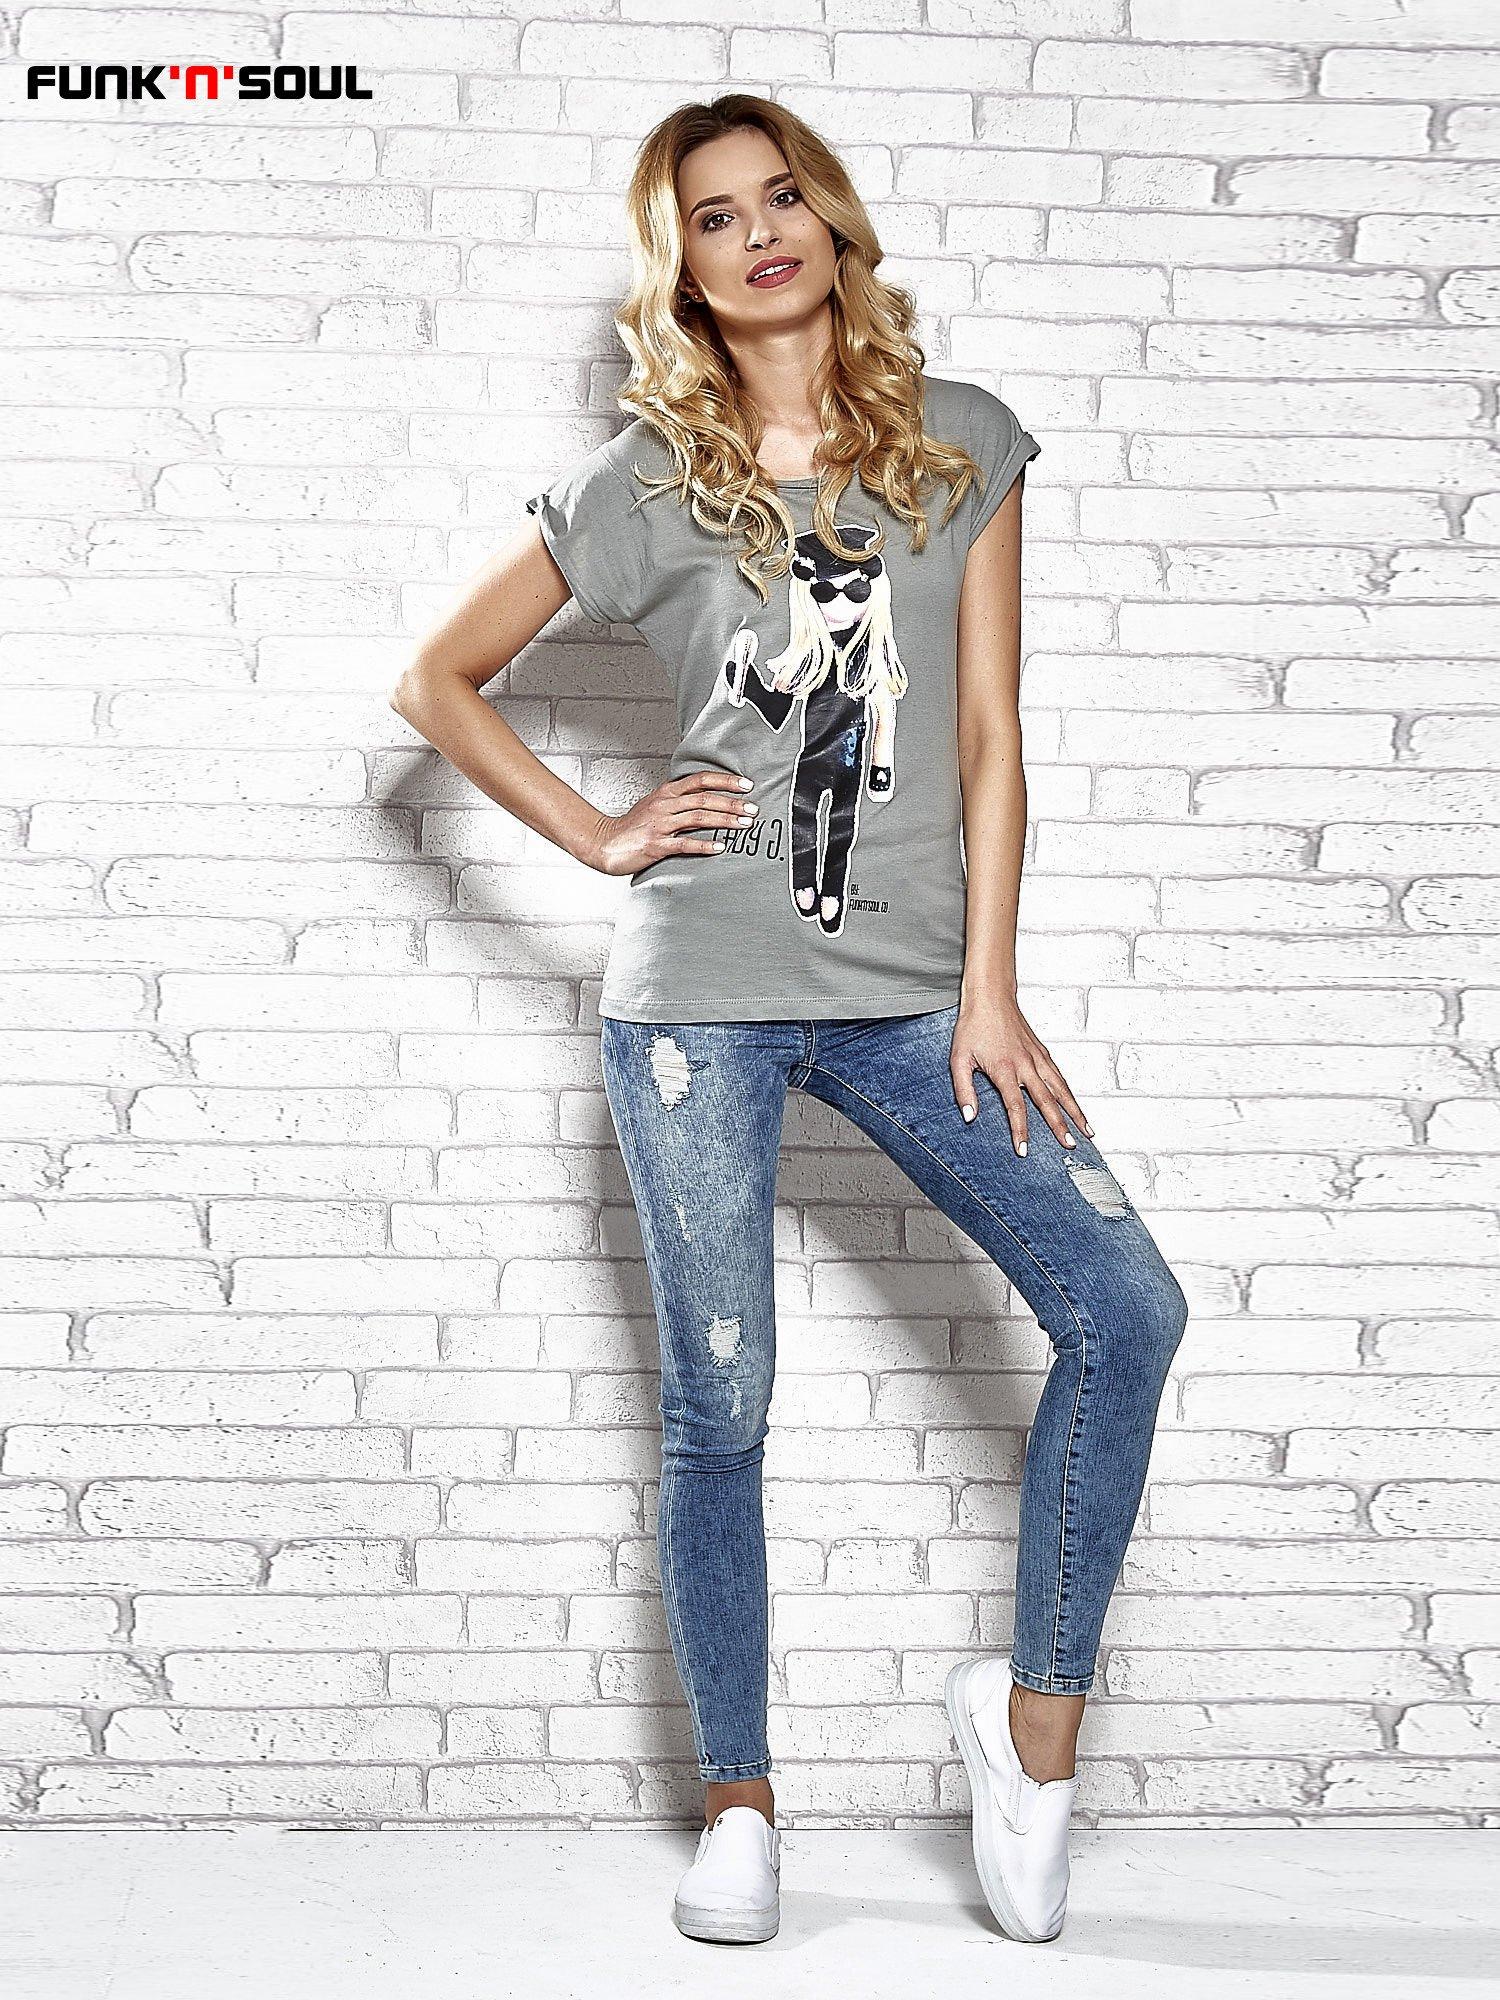 Szary t-shirt z nadrukiem Lady Gaga Funk n Soul                                  zdj.                                  7